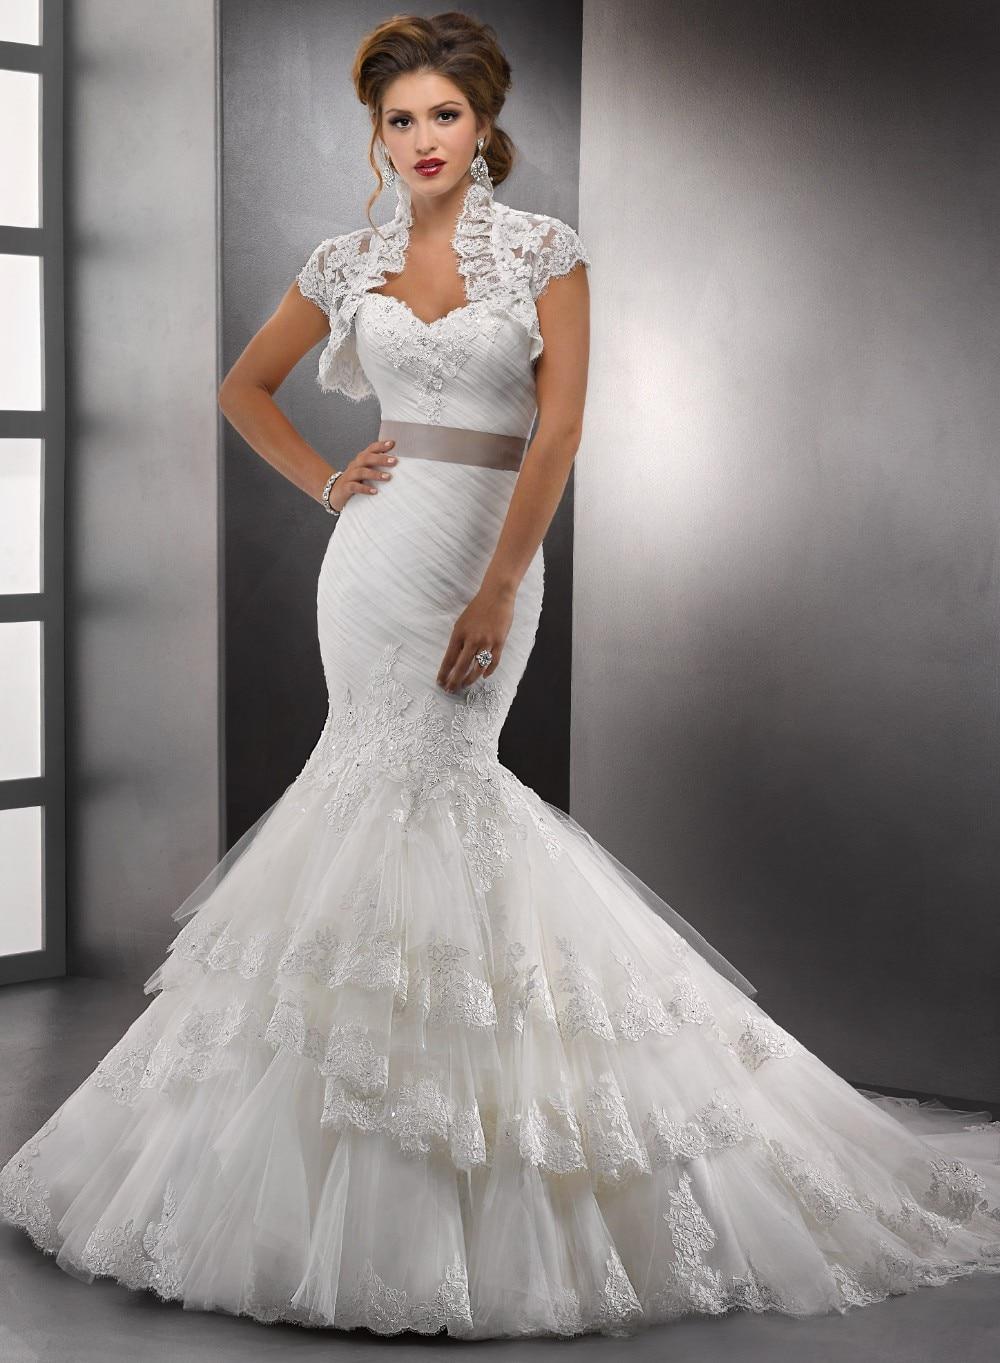 sweetheart mermaid wedding dresses with bling sweetheart mermaid wedding dresses Mermaid Wedding Dress With Bling Naf Dresses Simple Sweetheart